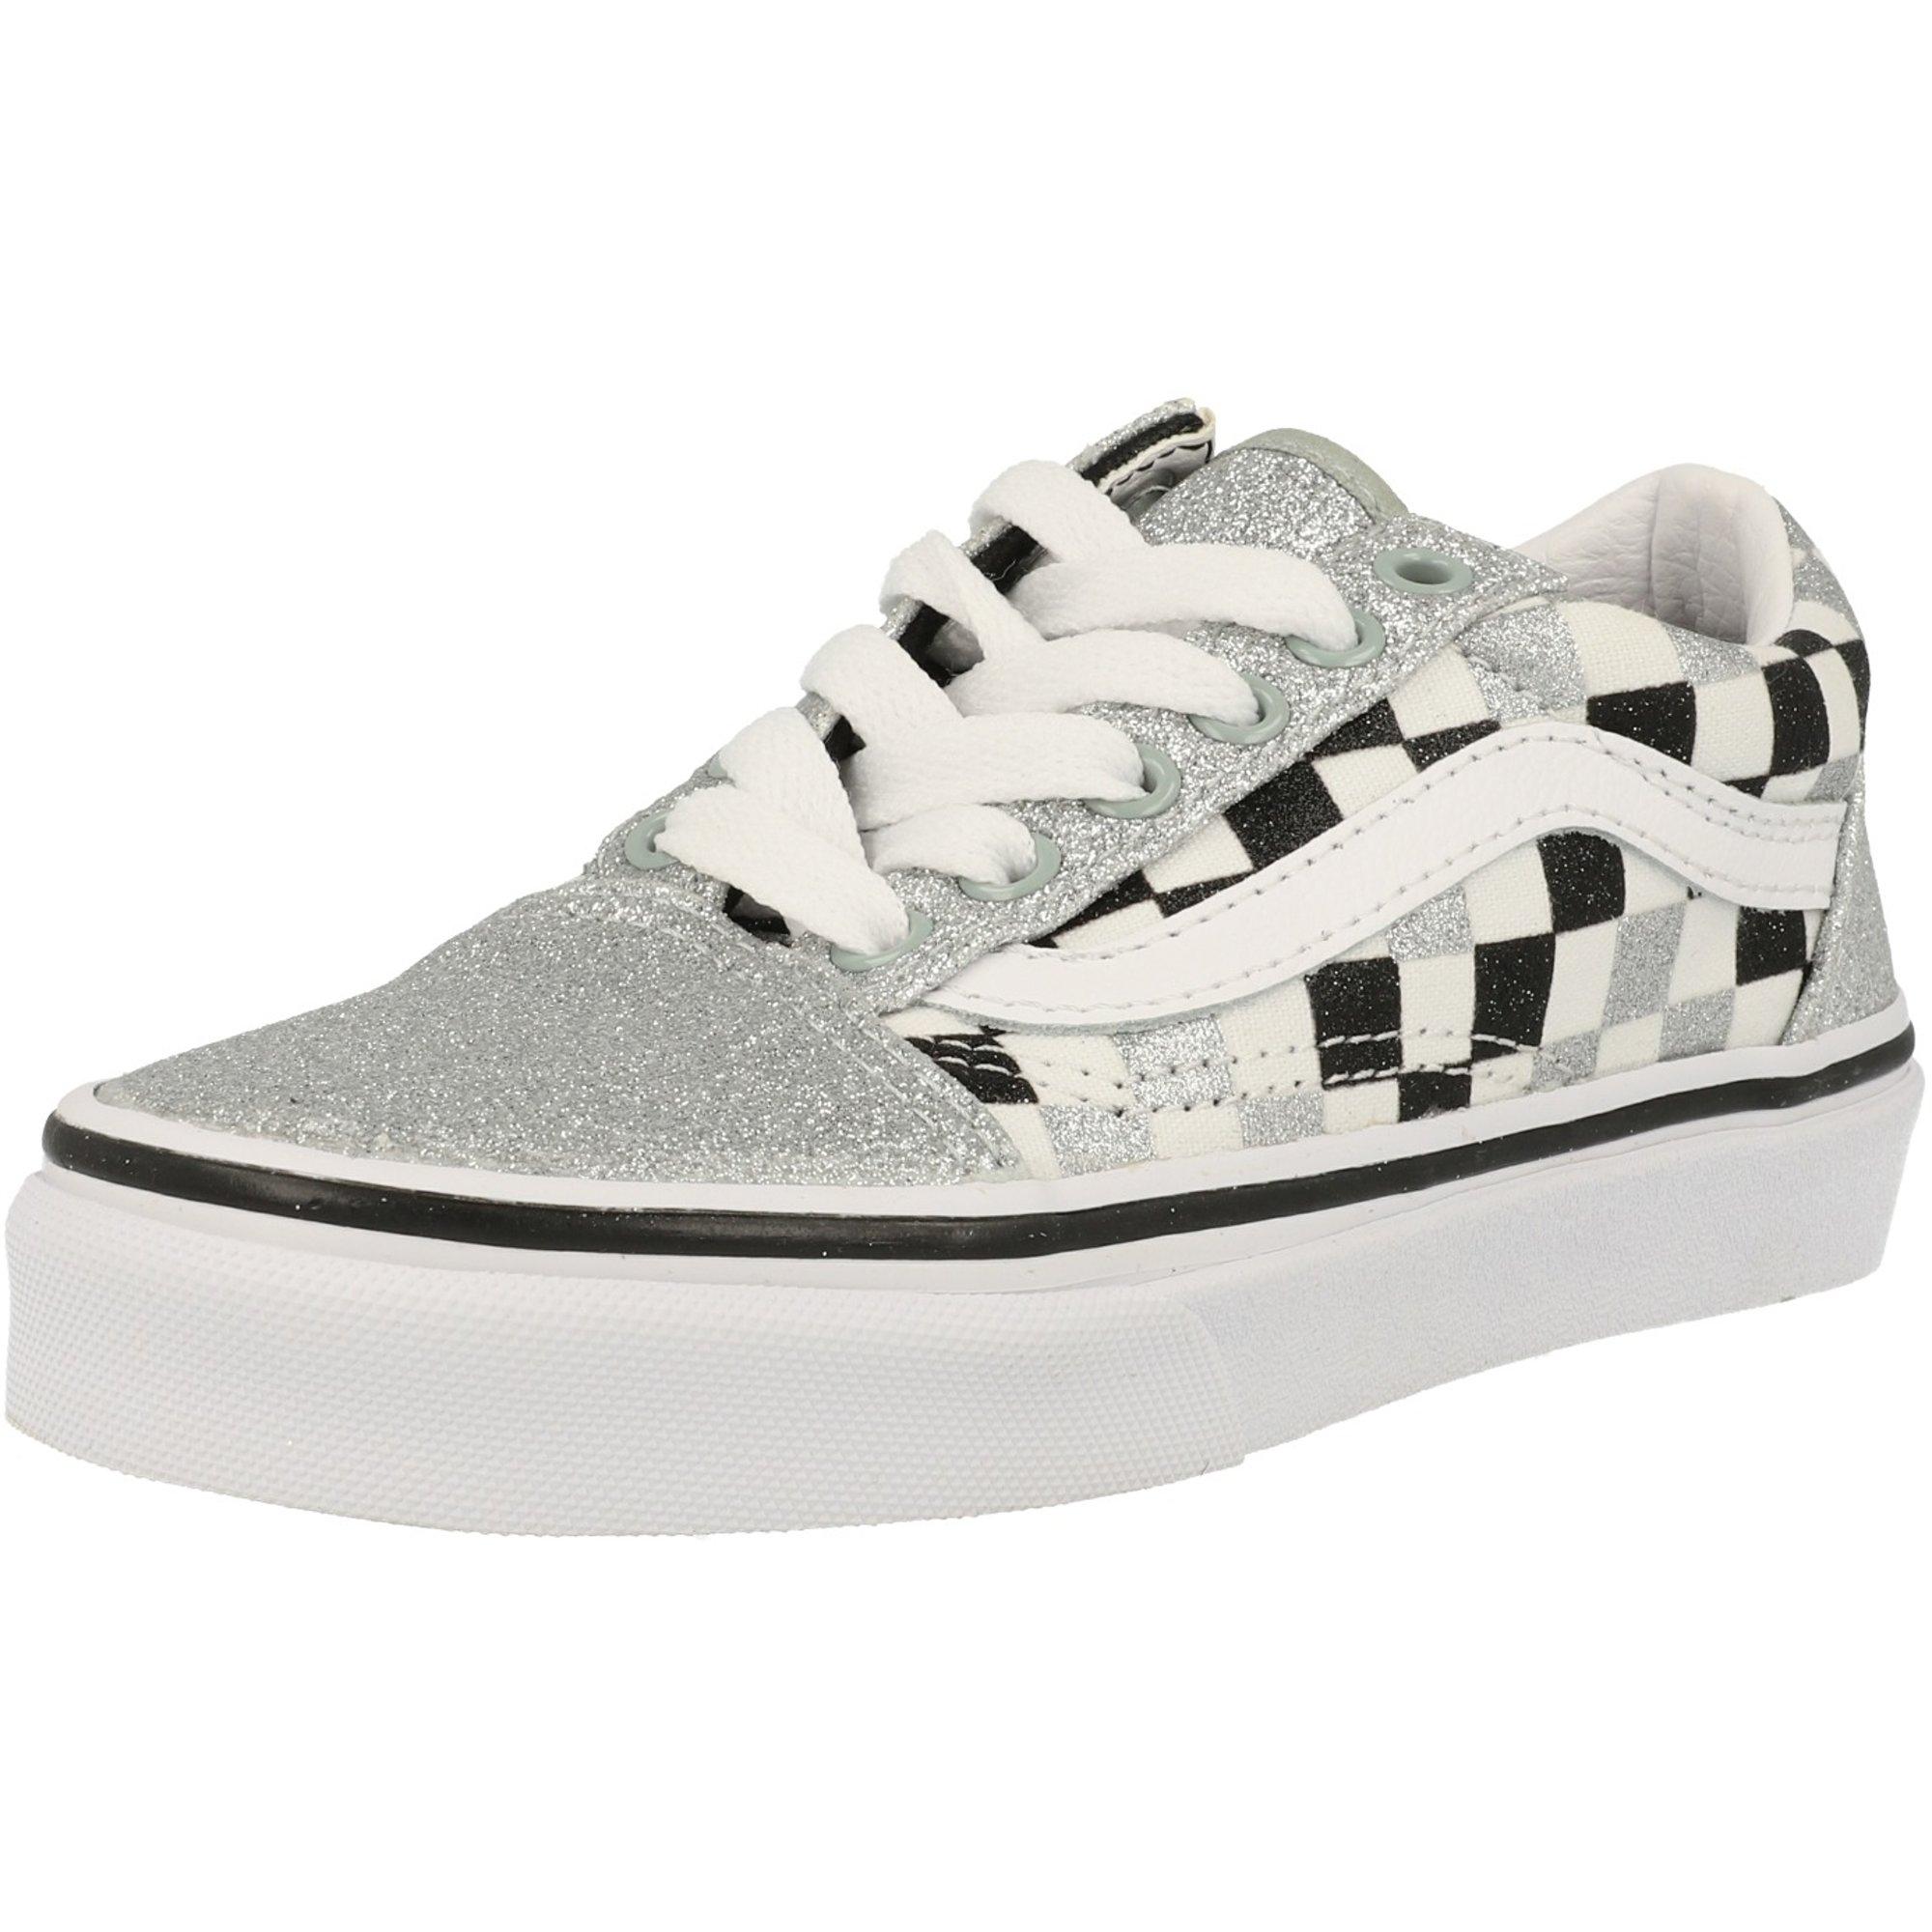 Vans UY Old Skool Silver Glitter/True